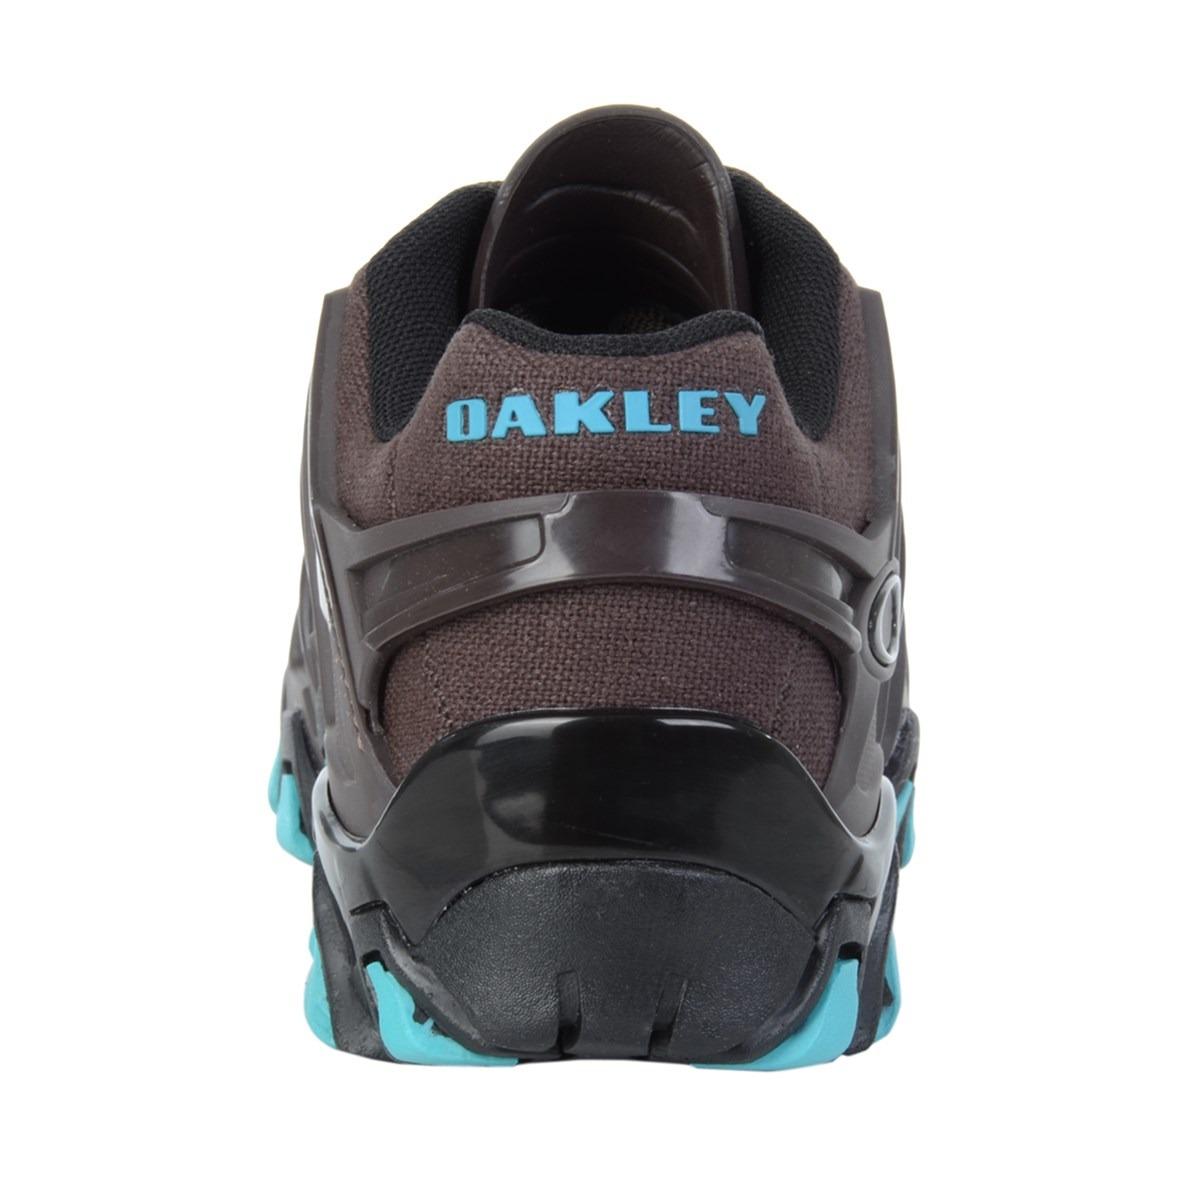 527c384056d8f tênis oakley hardshell 2 havana. Carregando zoom.